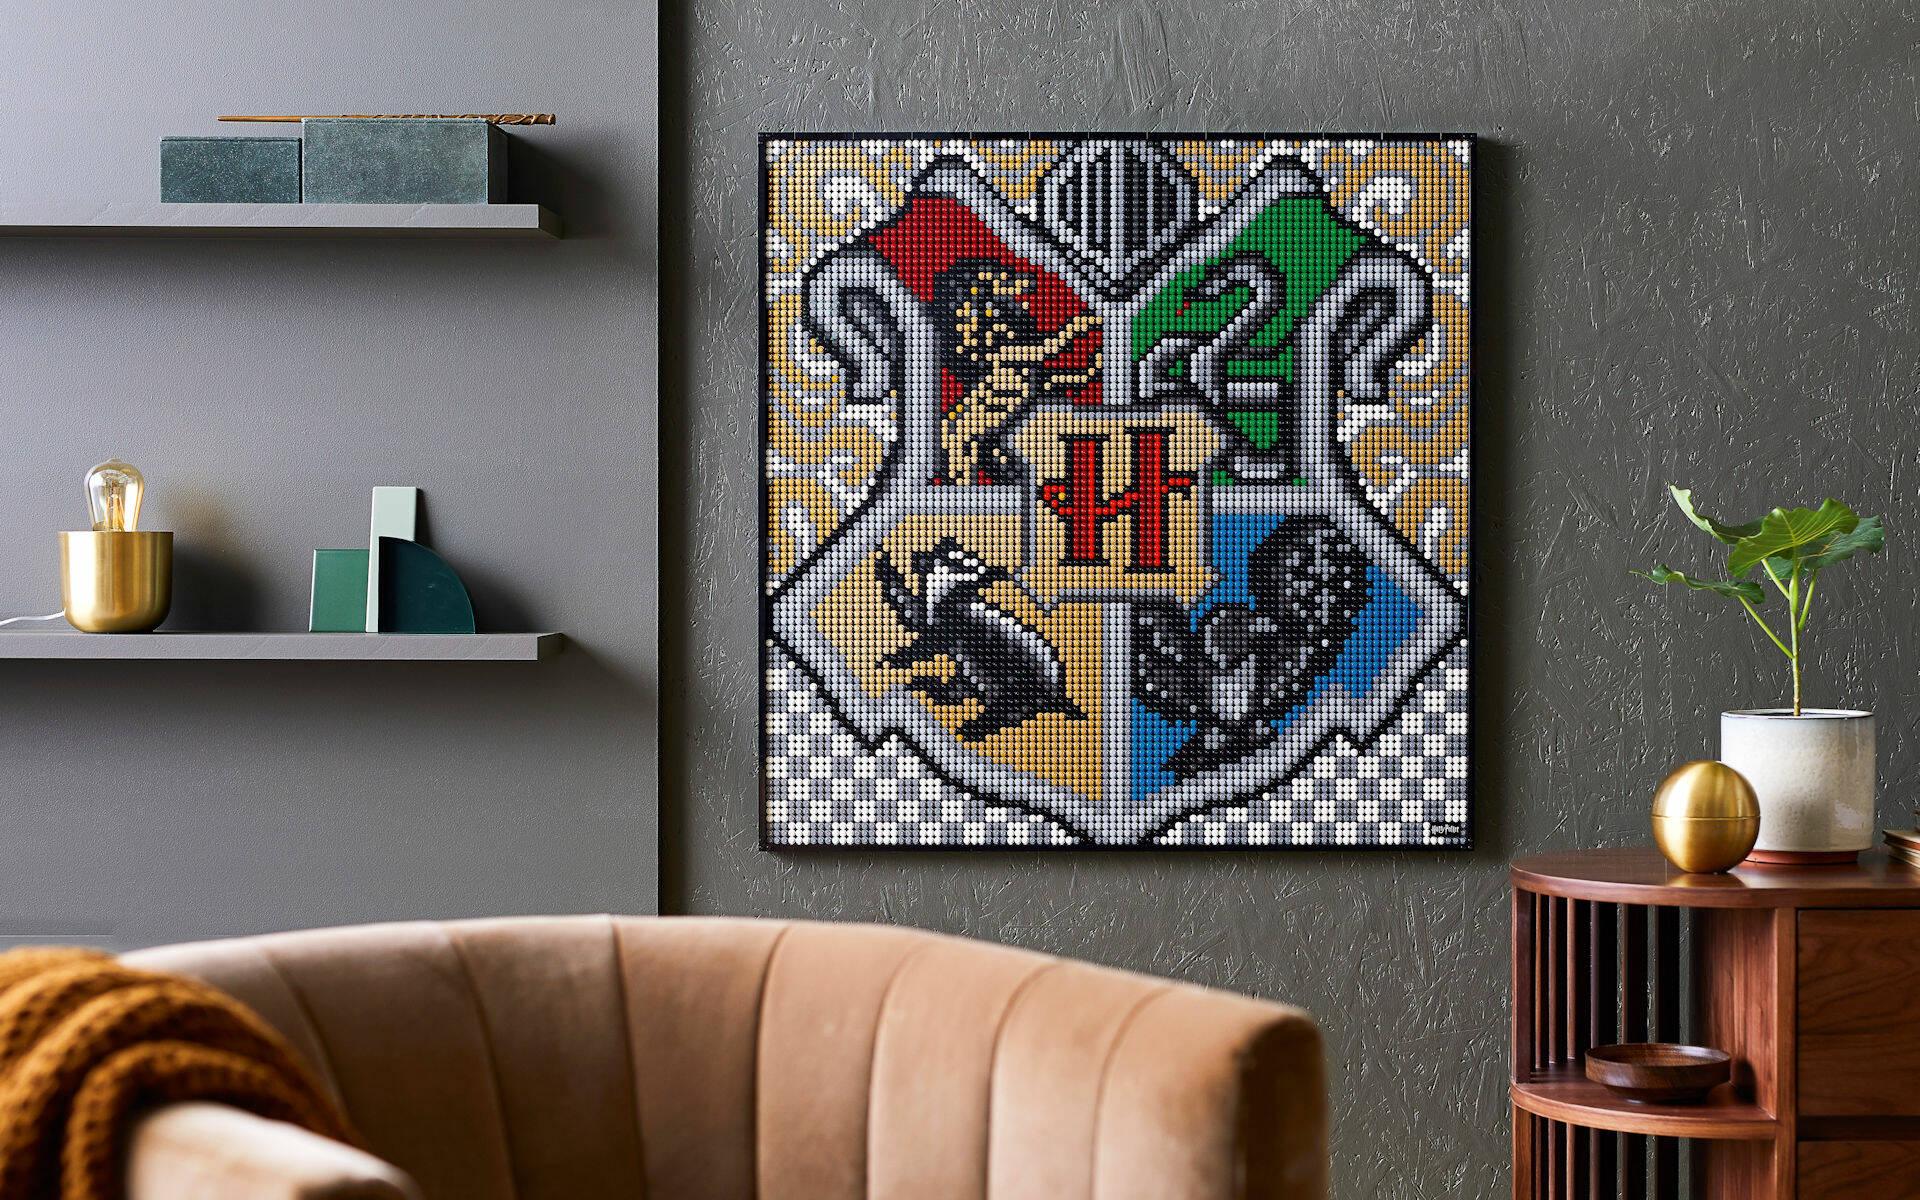 LEGO ART 31201 CASE DI HOGWARTS